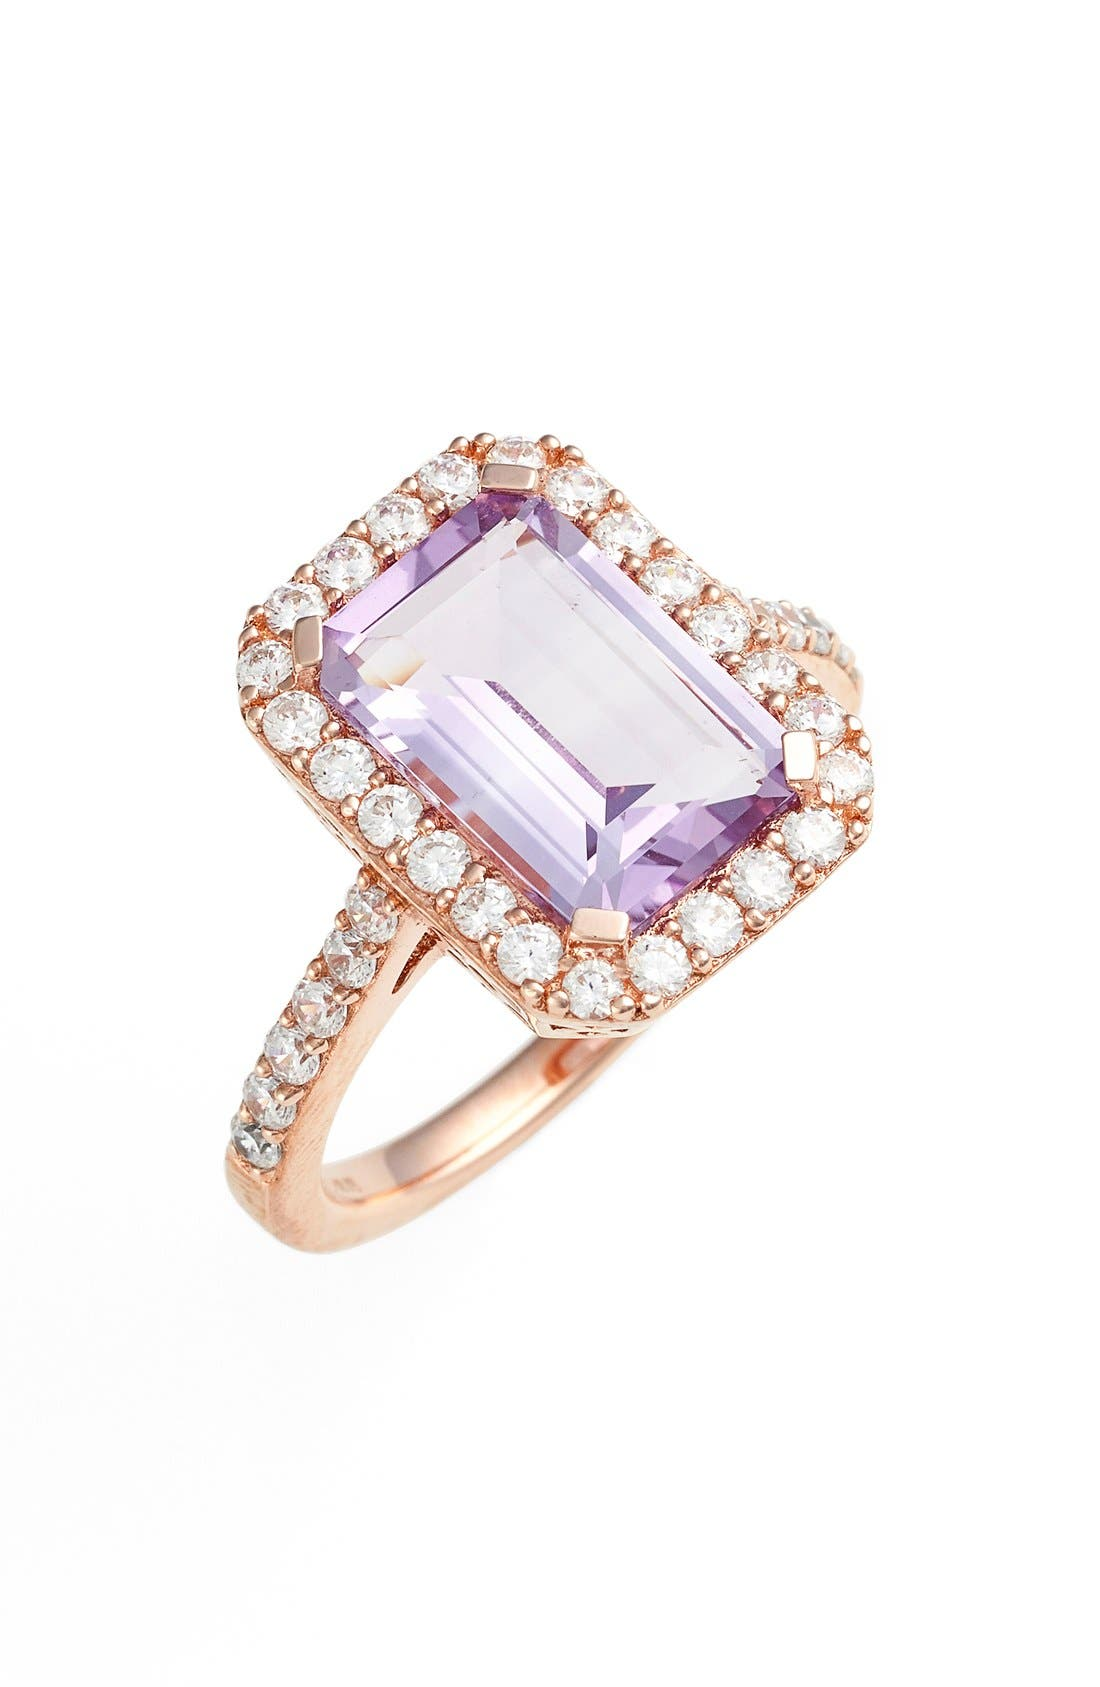 Lafonn 'Aria' Emerald Cut Ring